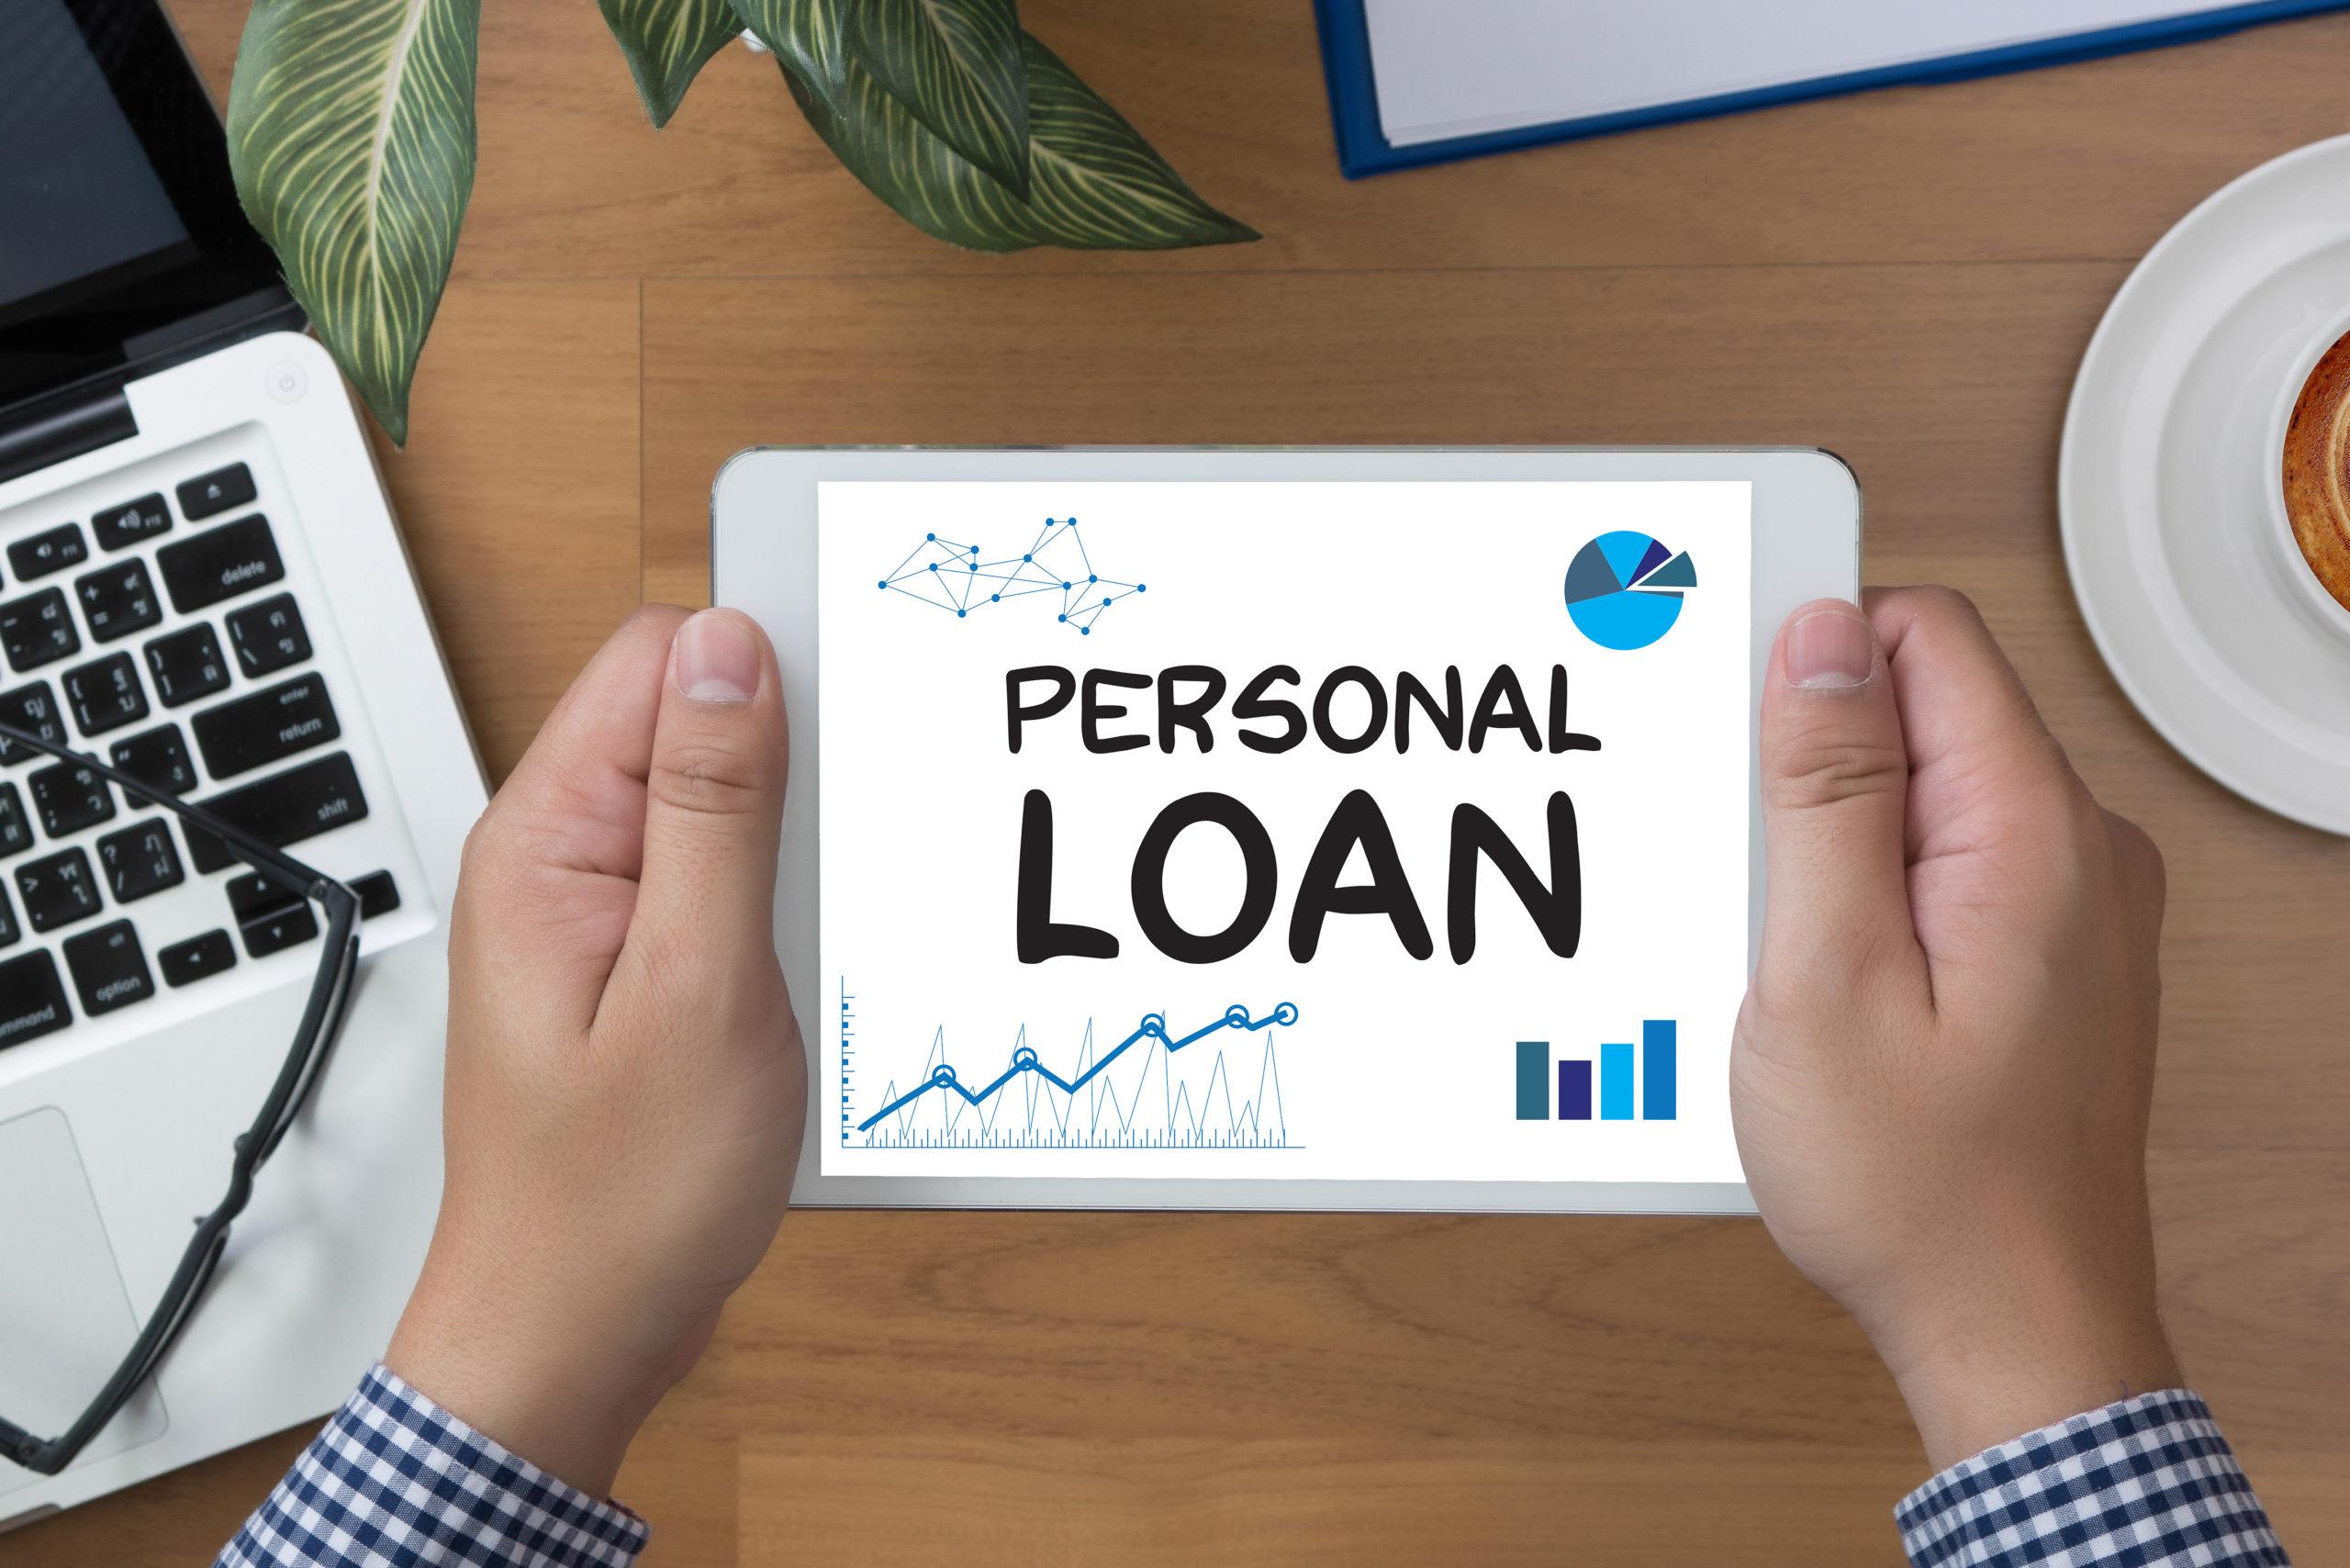 personal-loan-man-hand